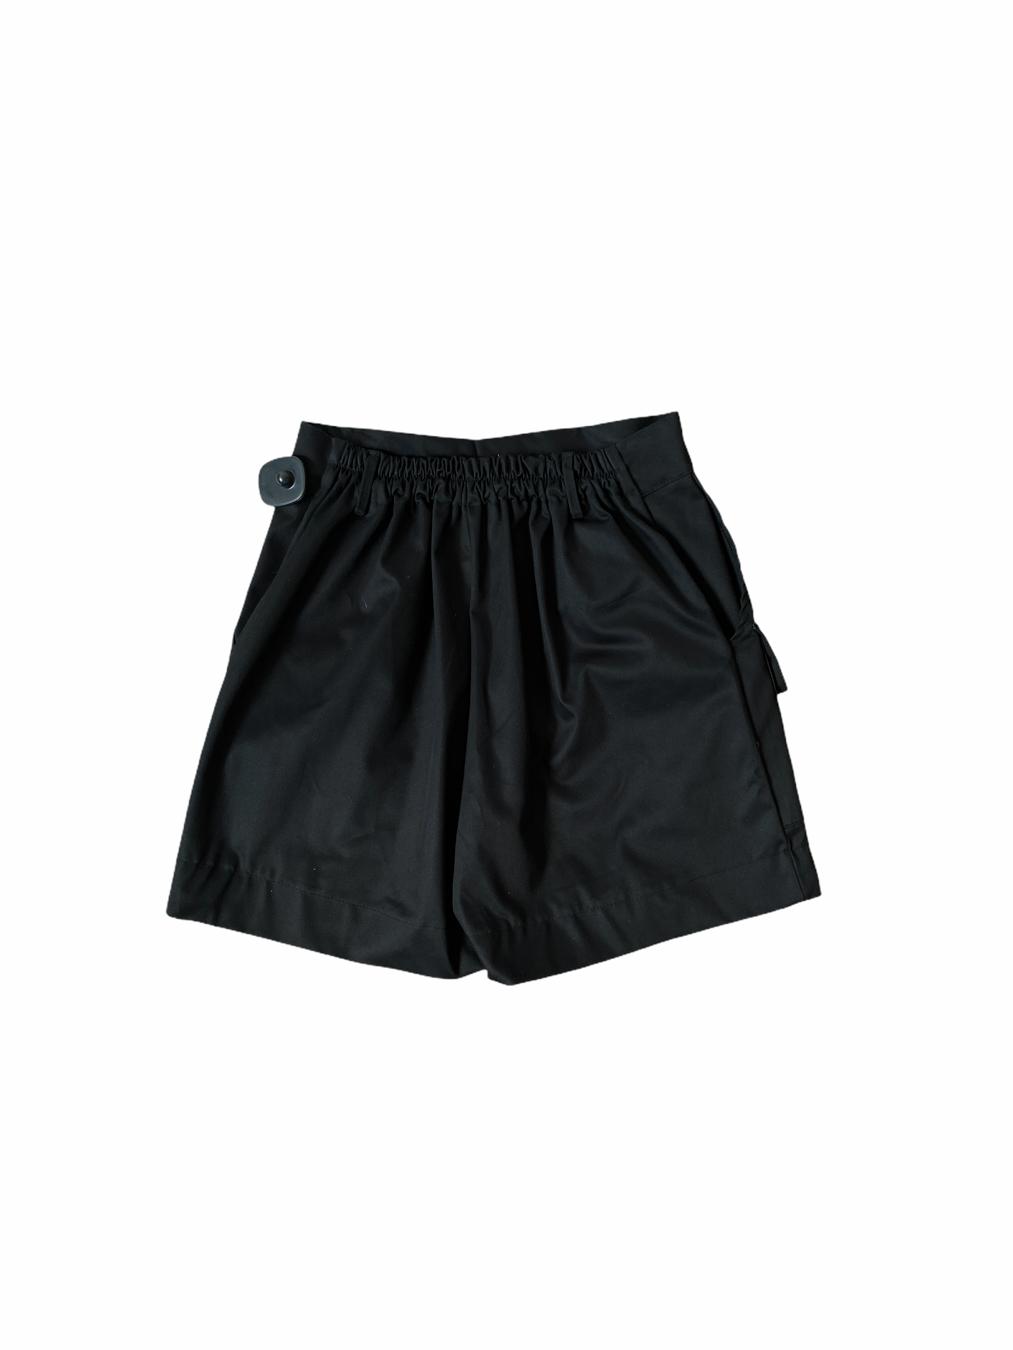 Rally Short (Black)